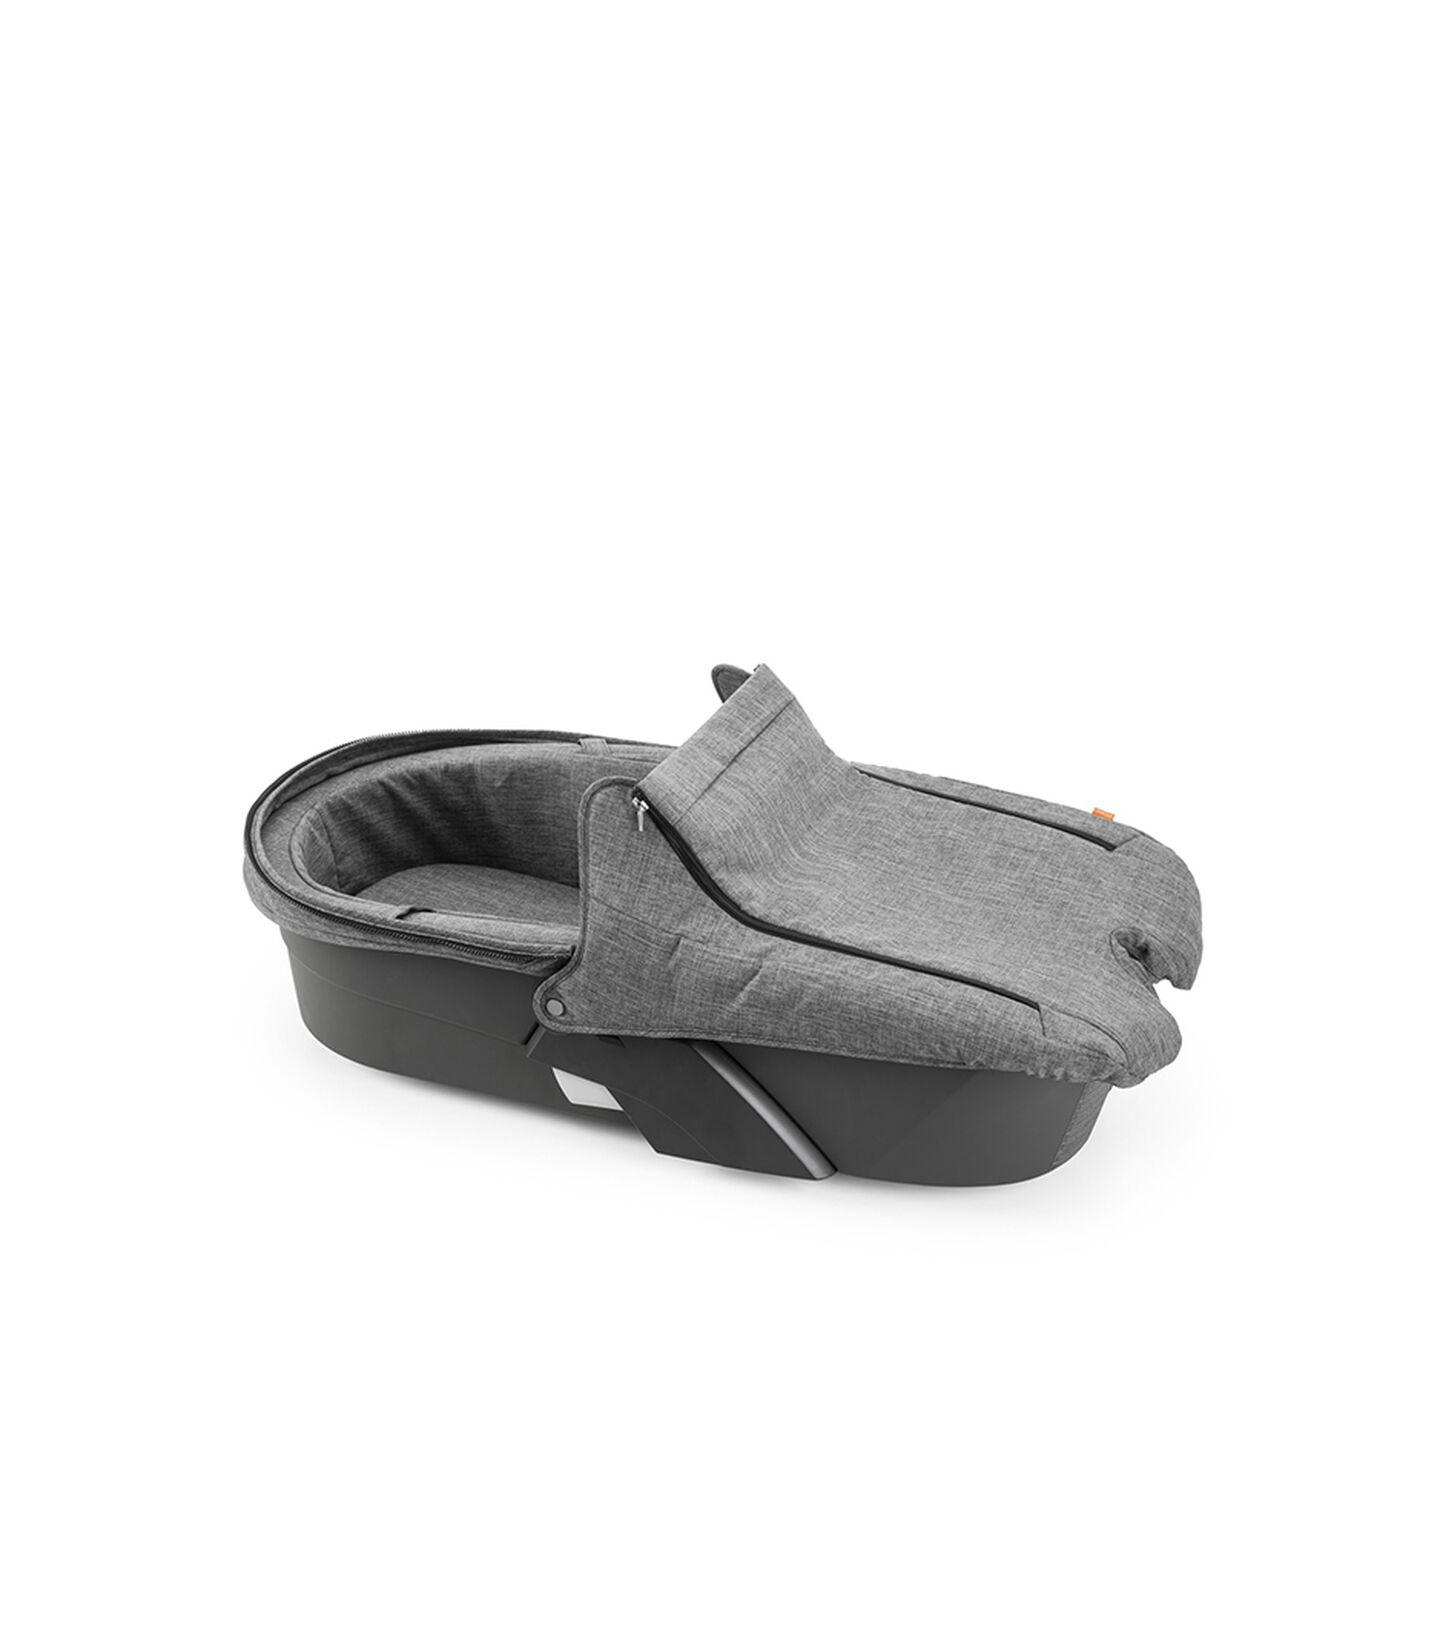 Stokke® Xplory® Carry Cot style kit Black Melange, Black Melange, mainview view 2